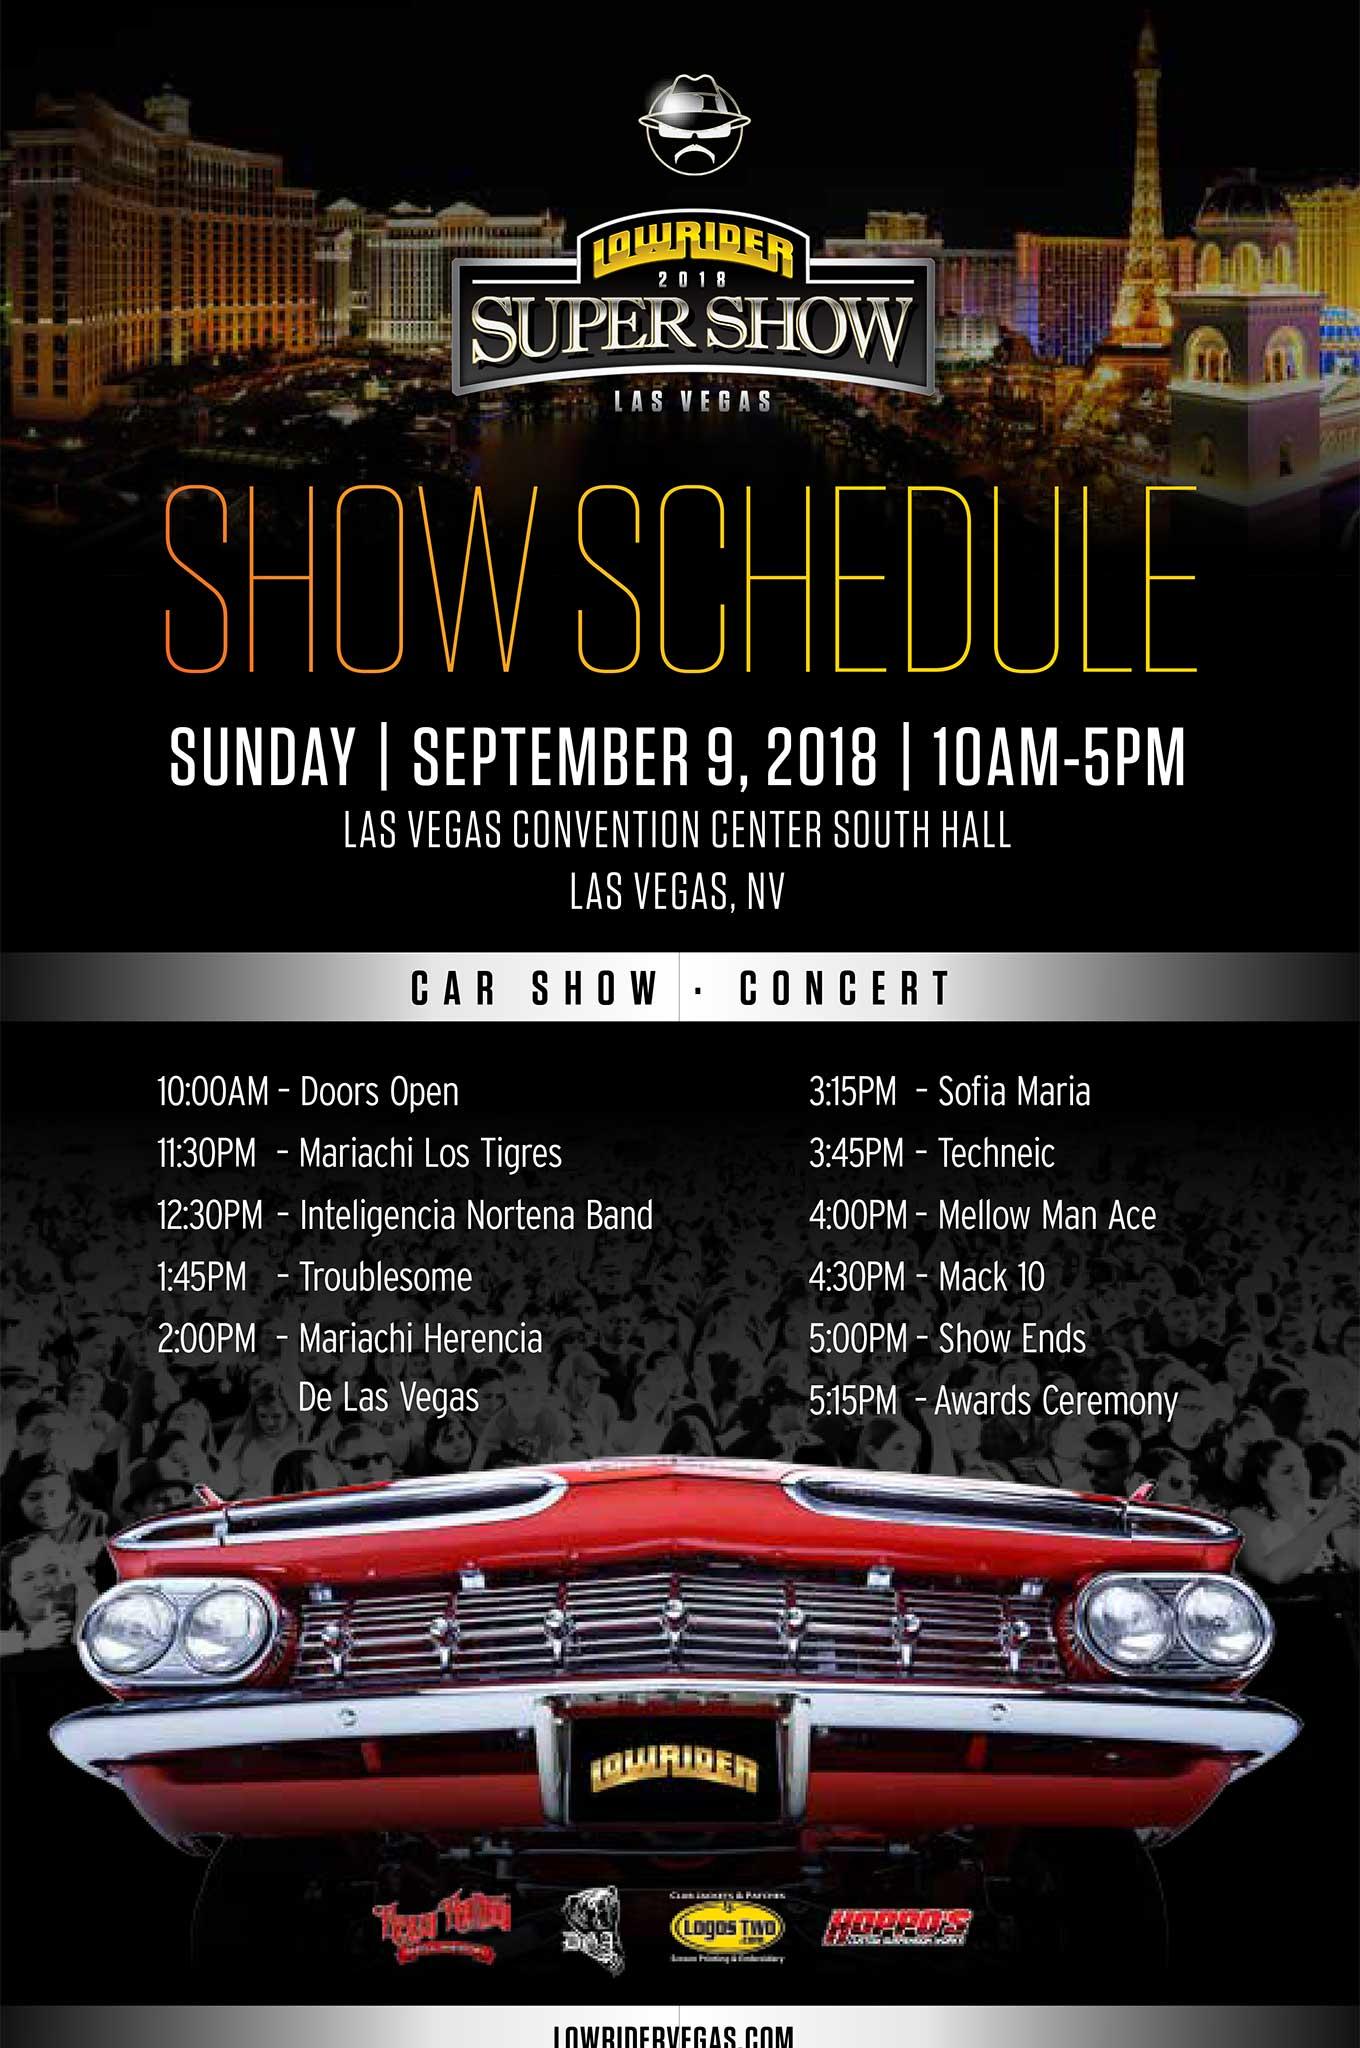 Las Vegas Super Show - Car show in vegas 2018